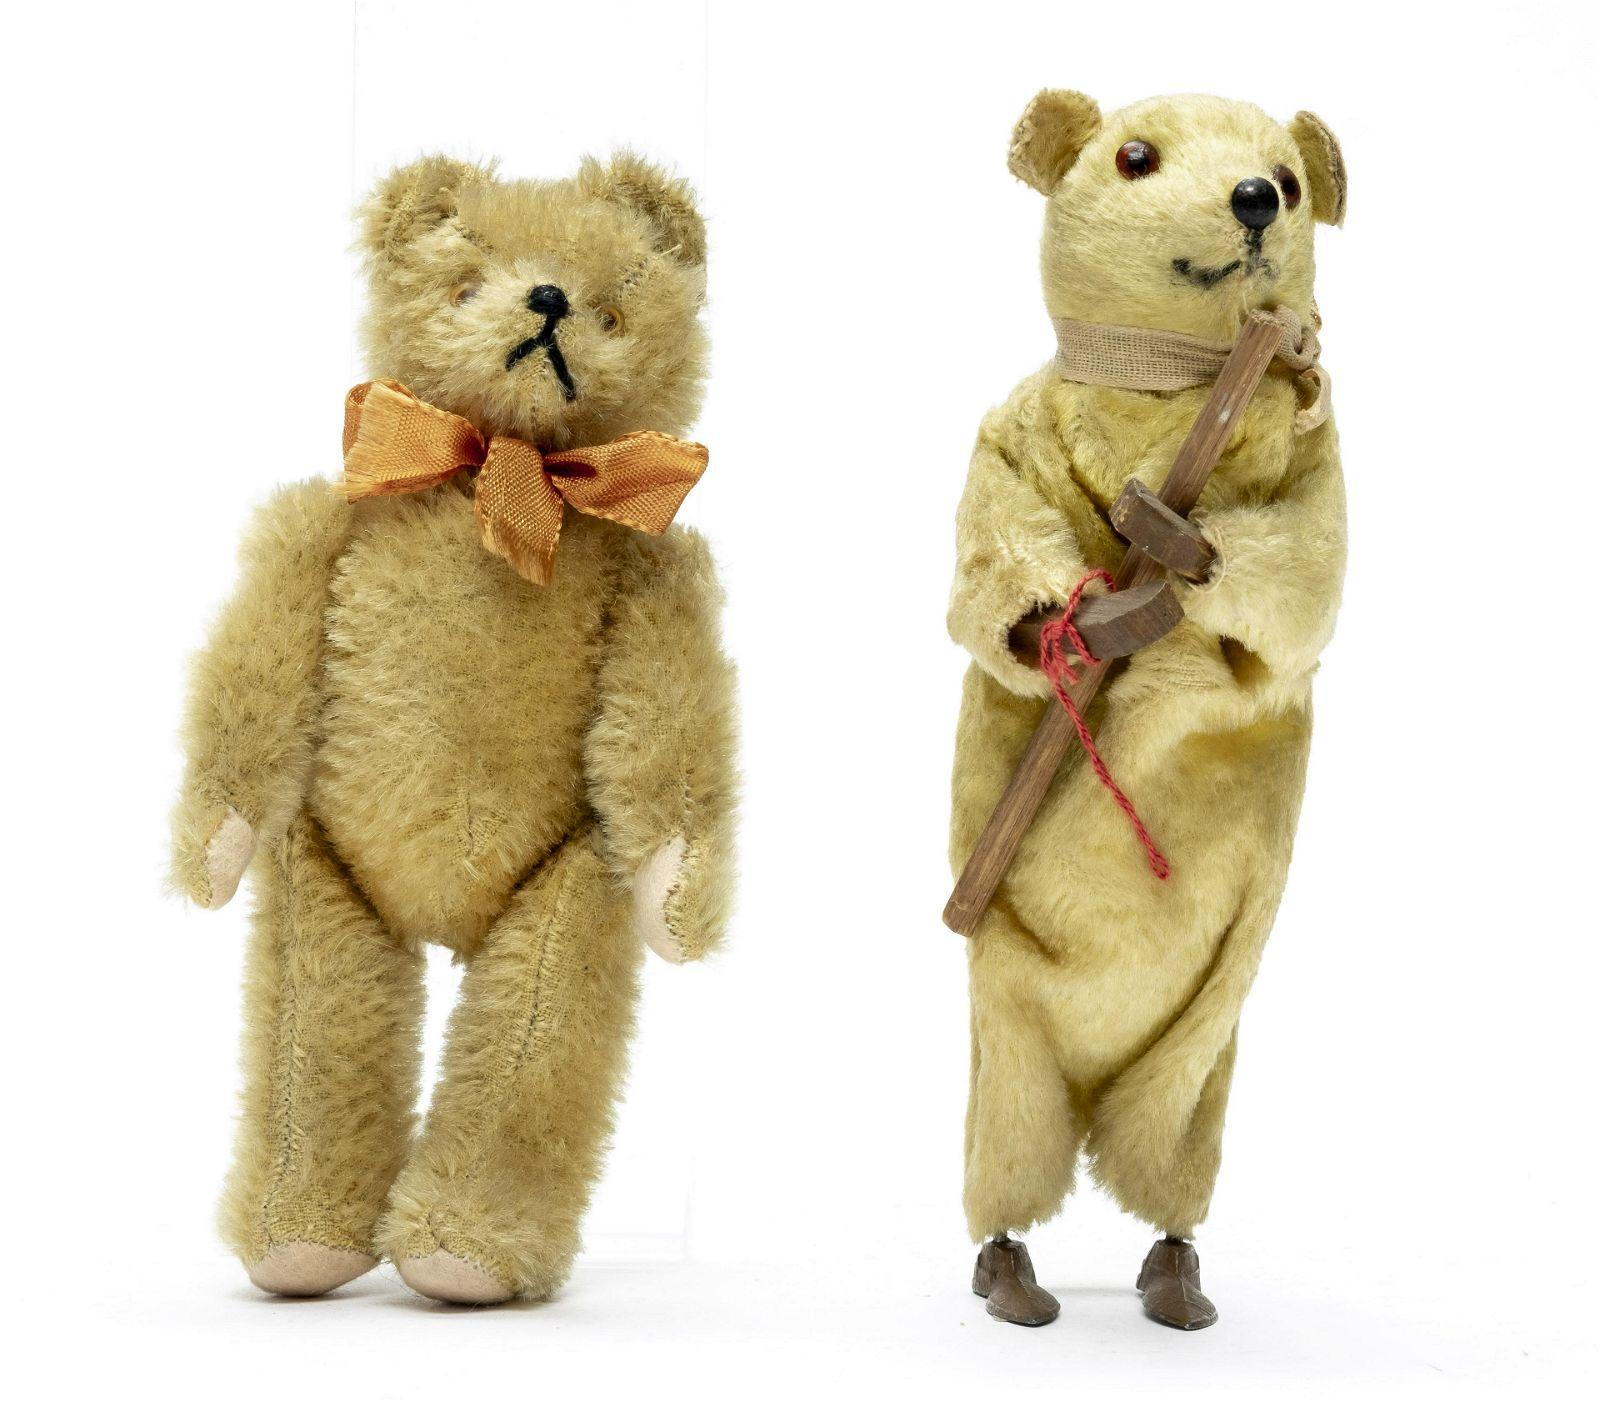 Two Teddy Bear Toys